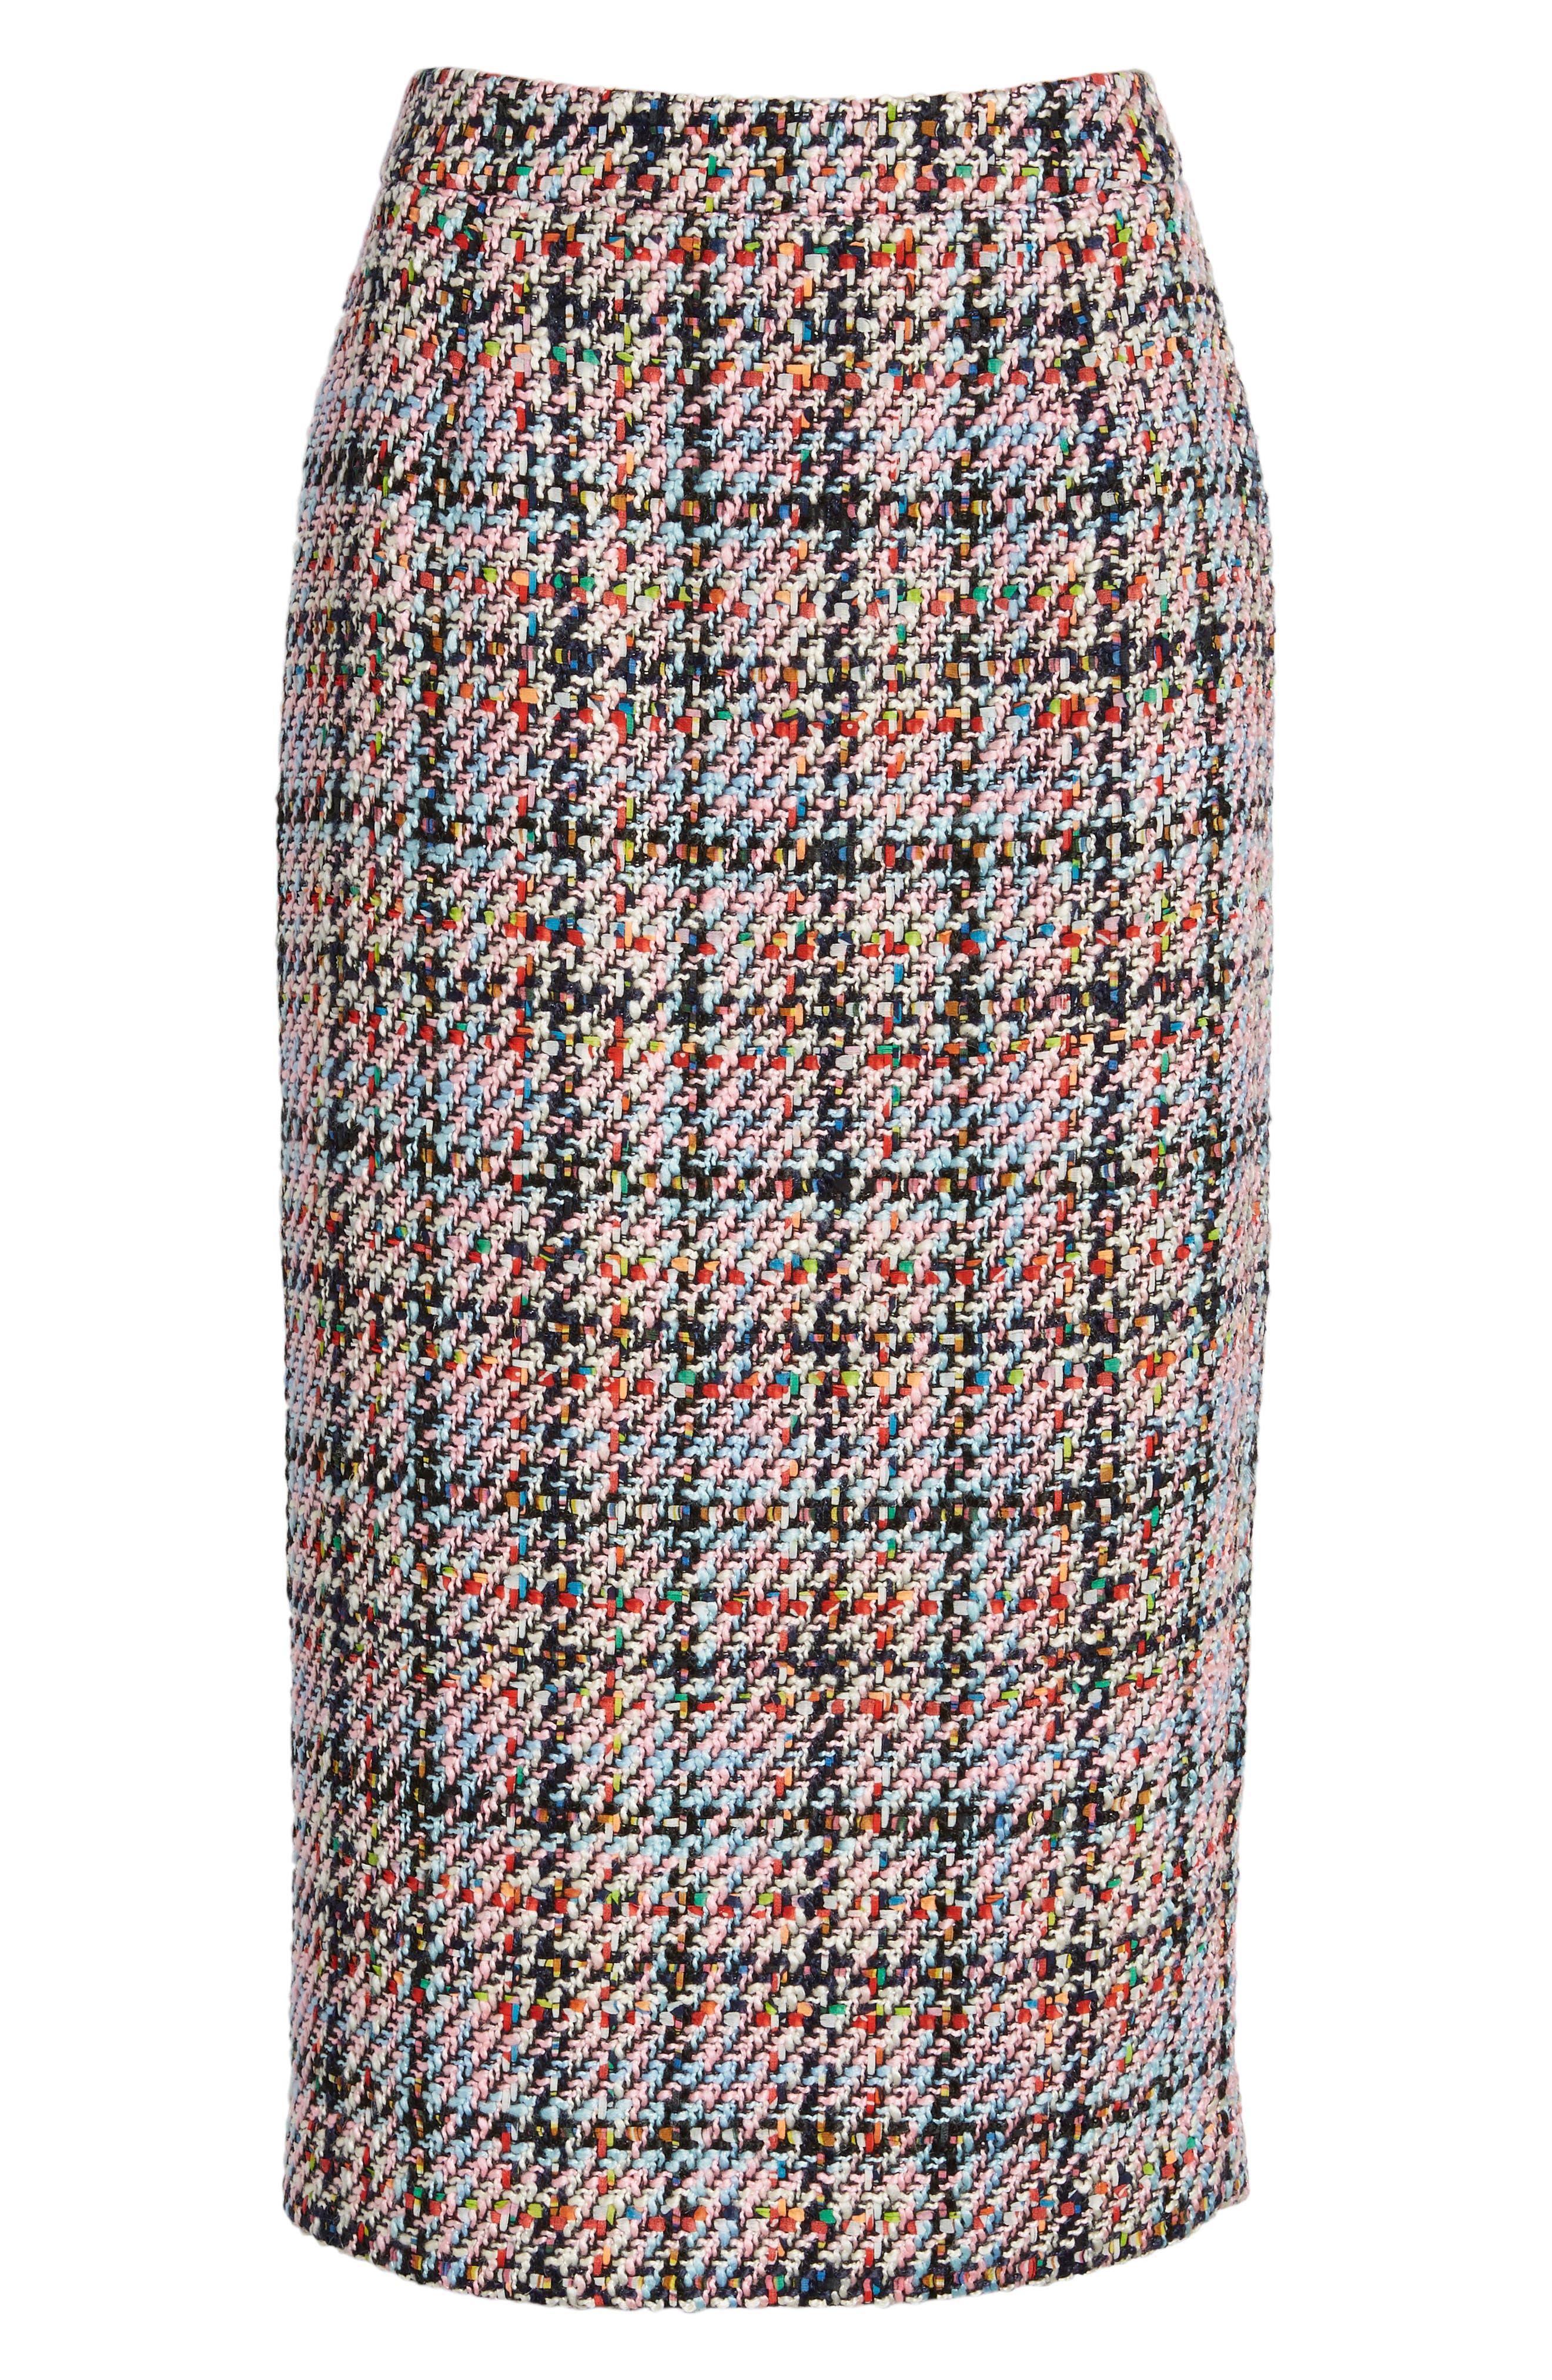 Tweed Midi Skirt,                             Alternate thumbnail 6, color,                             Pink Multi Tweed